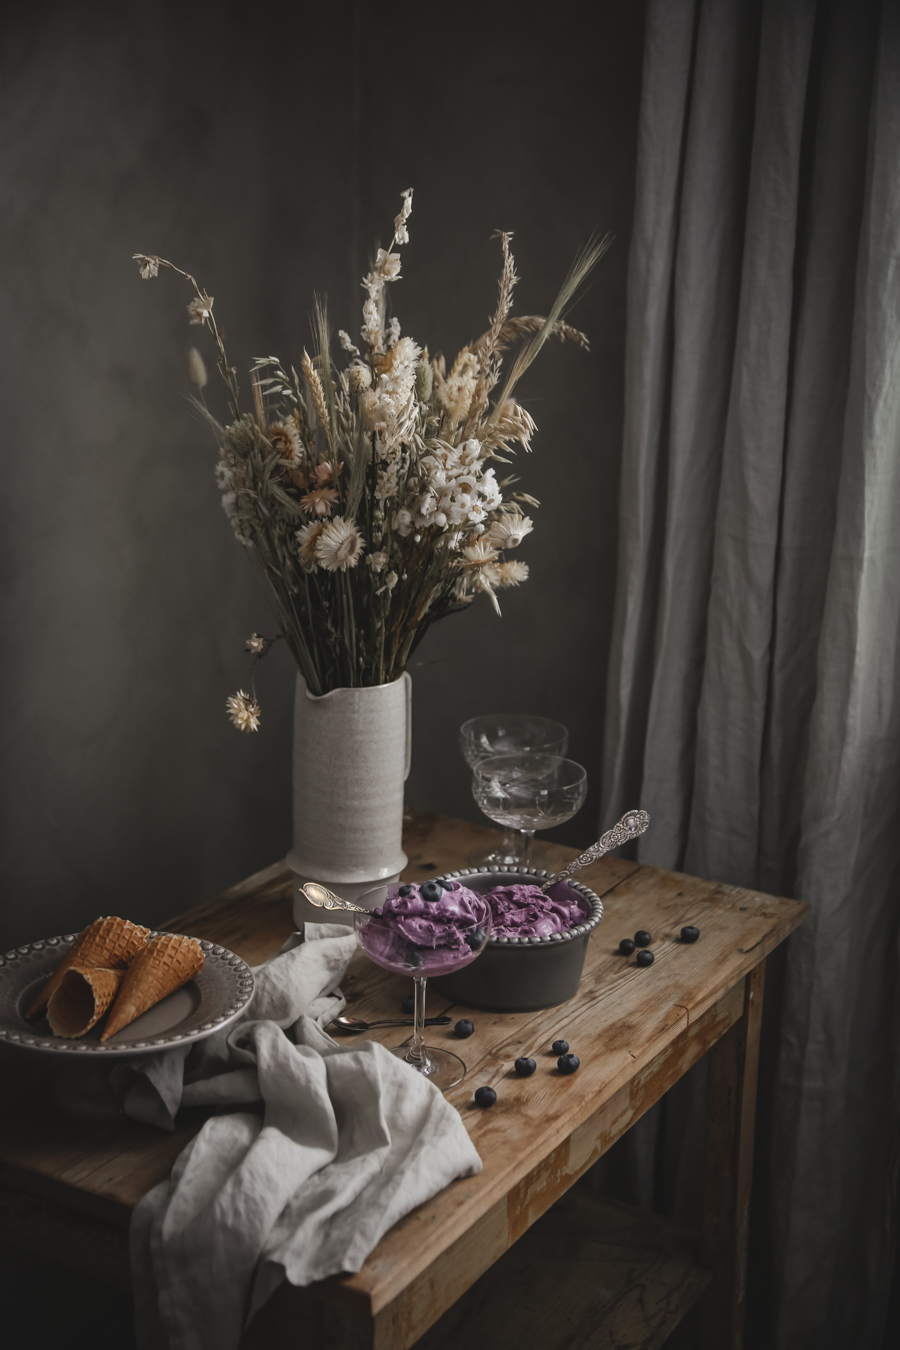 viktoria.holmgren.glassrecept.lovely.life